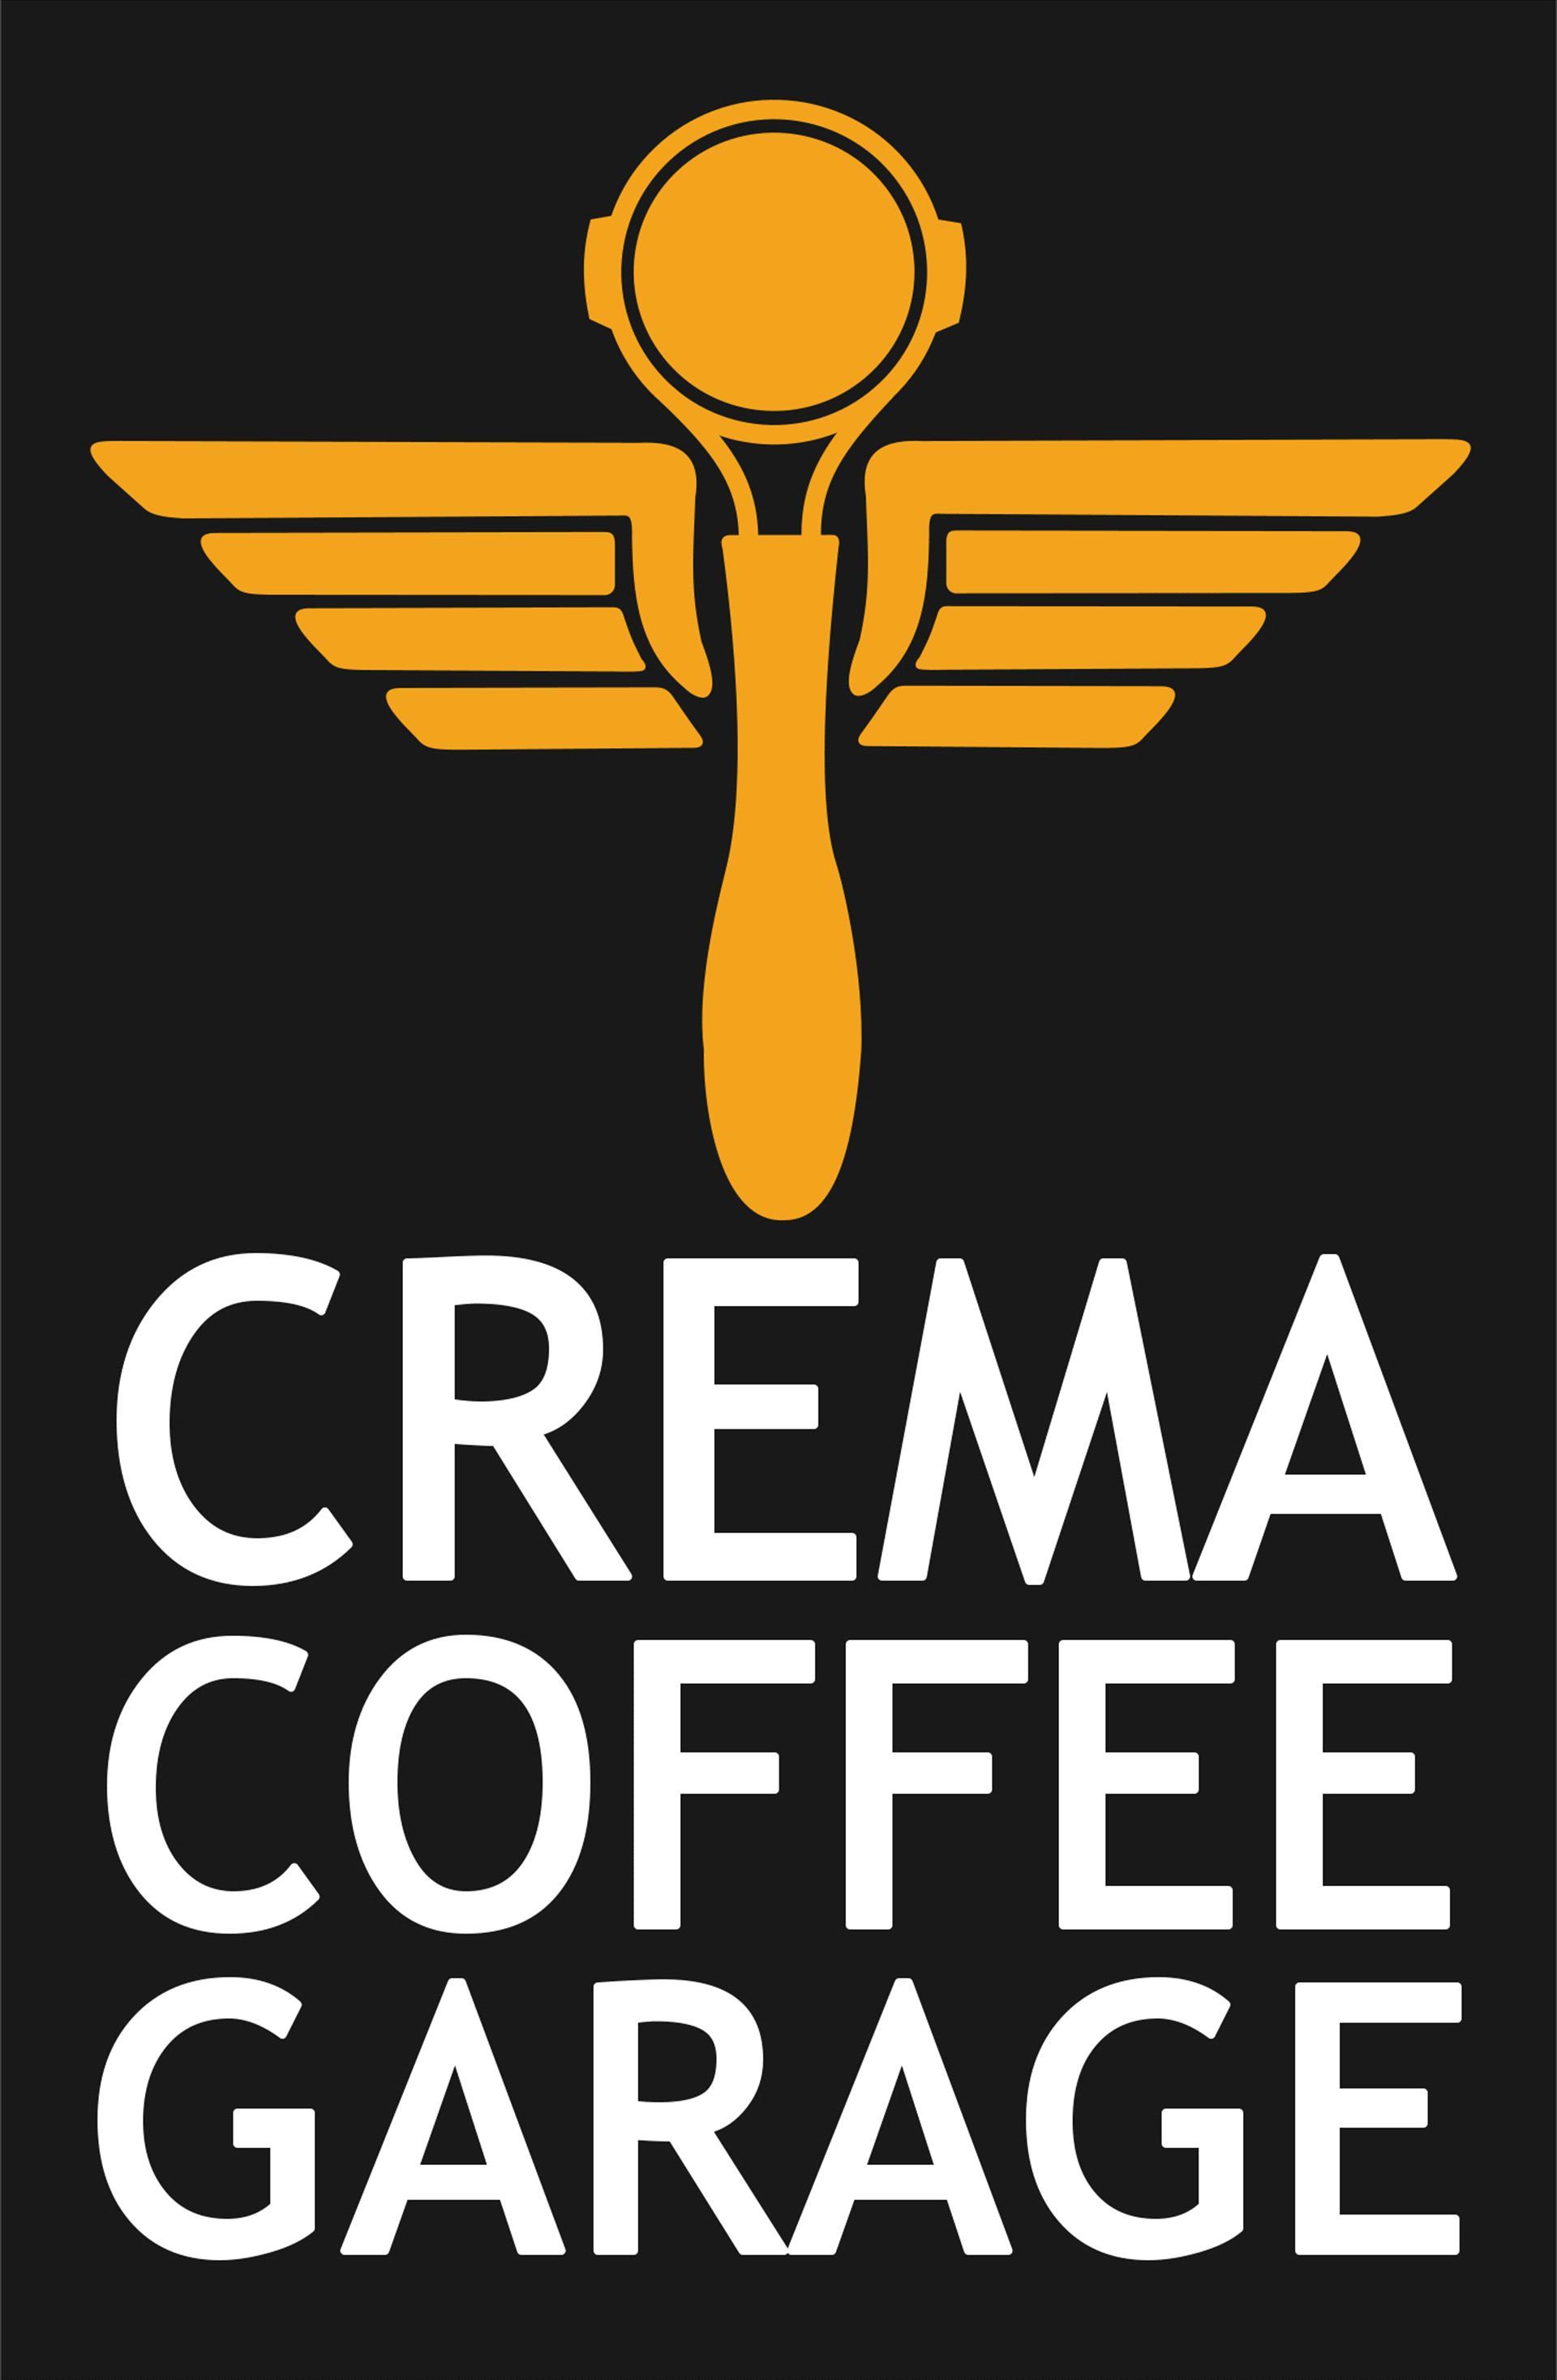 cremacoffeegarage.jpg